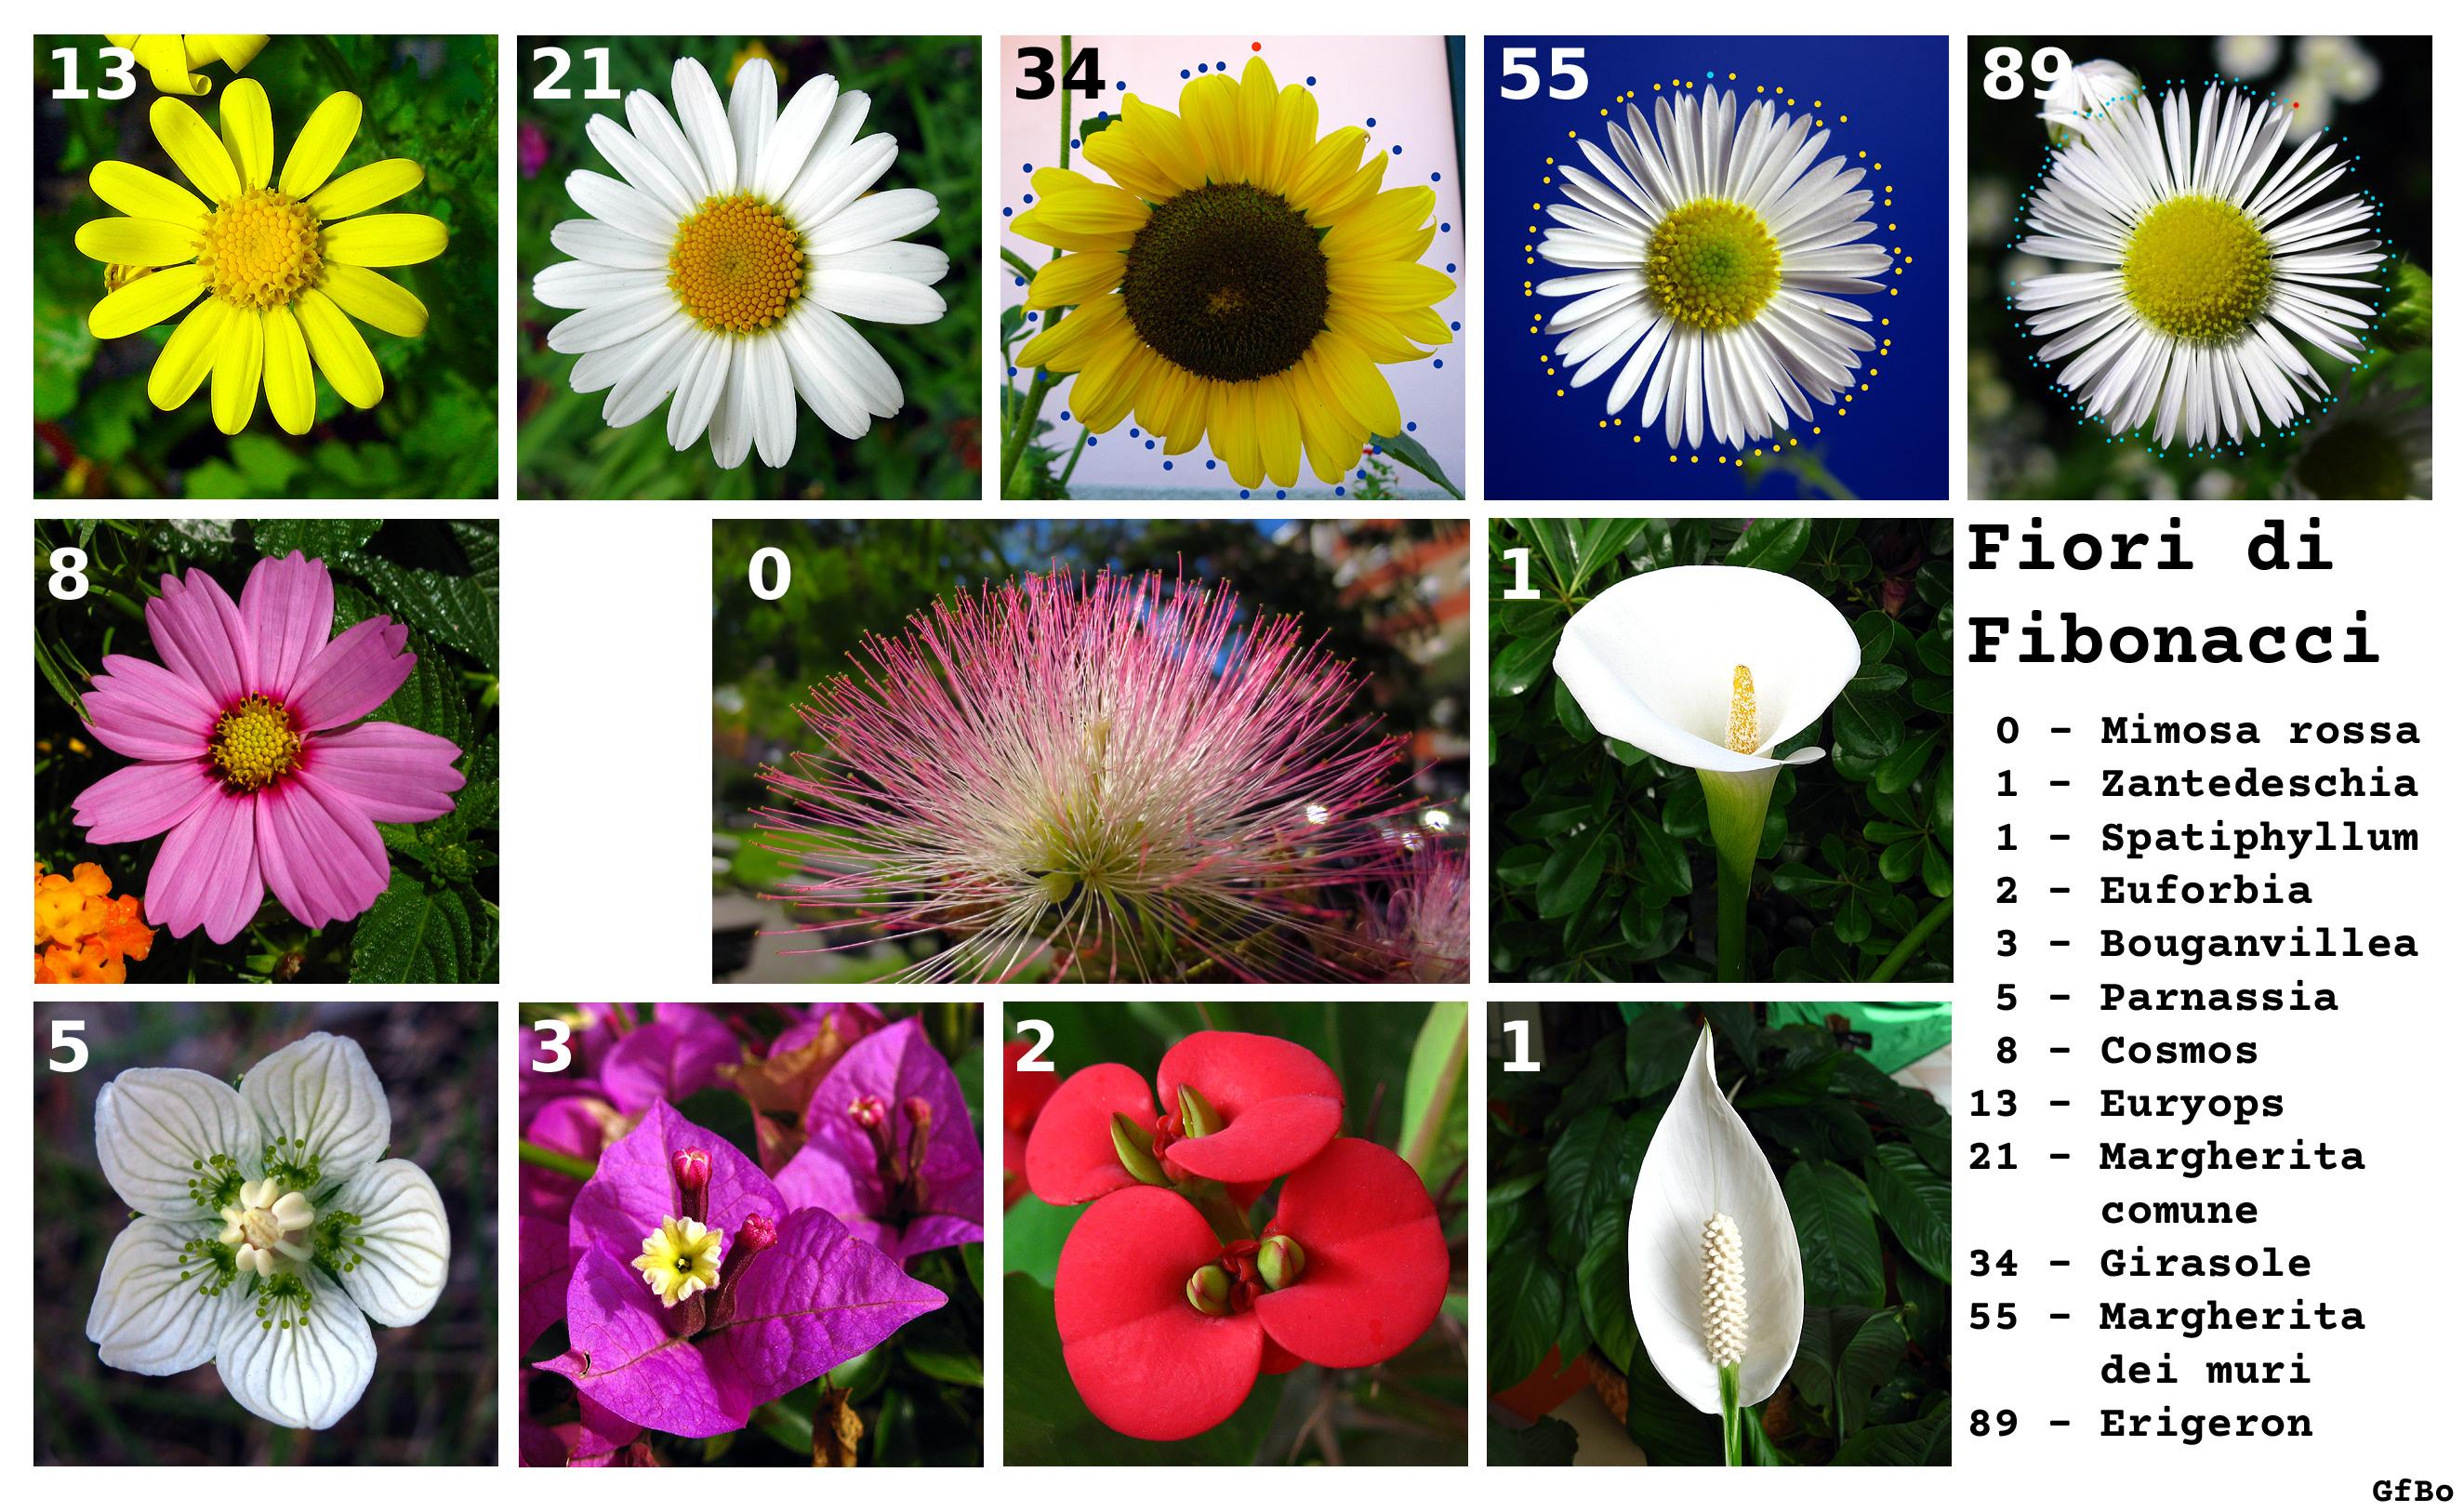 Tutti I Tipi Di Fiori.Fiori Di Fibonacci